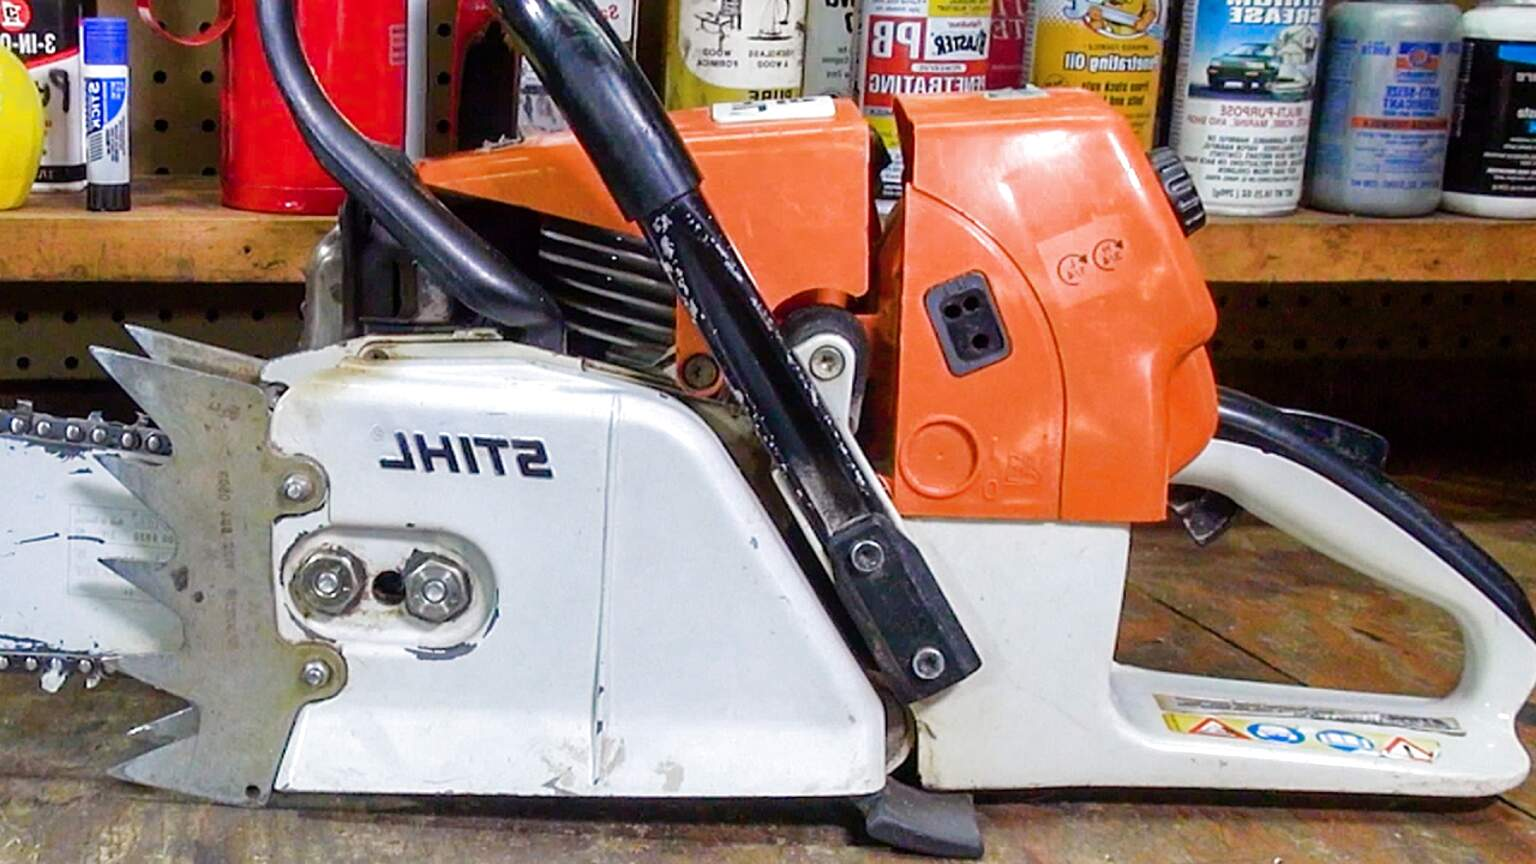 066 stihl chainsaw for sale